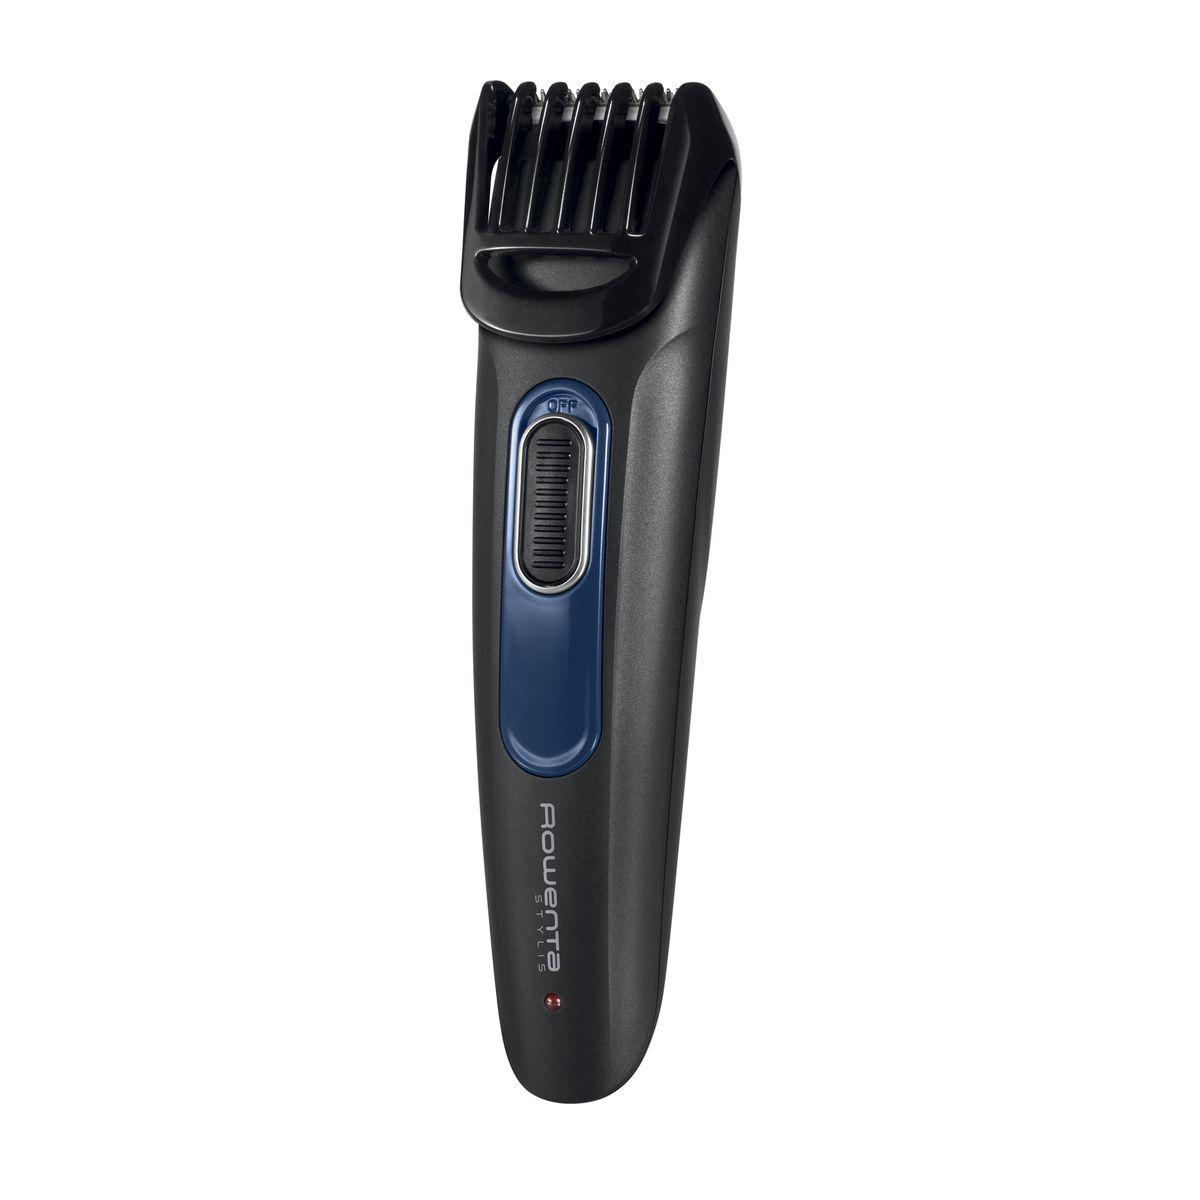 Tondeuse barbe TN2800F4, Précision 1 mm